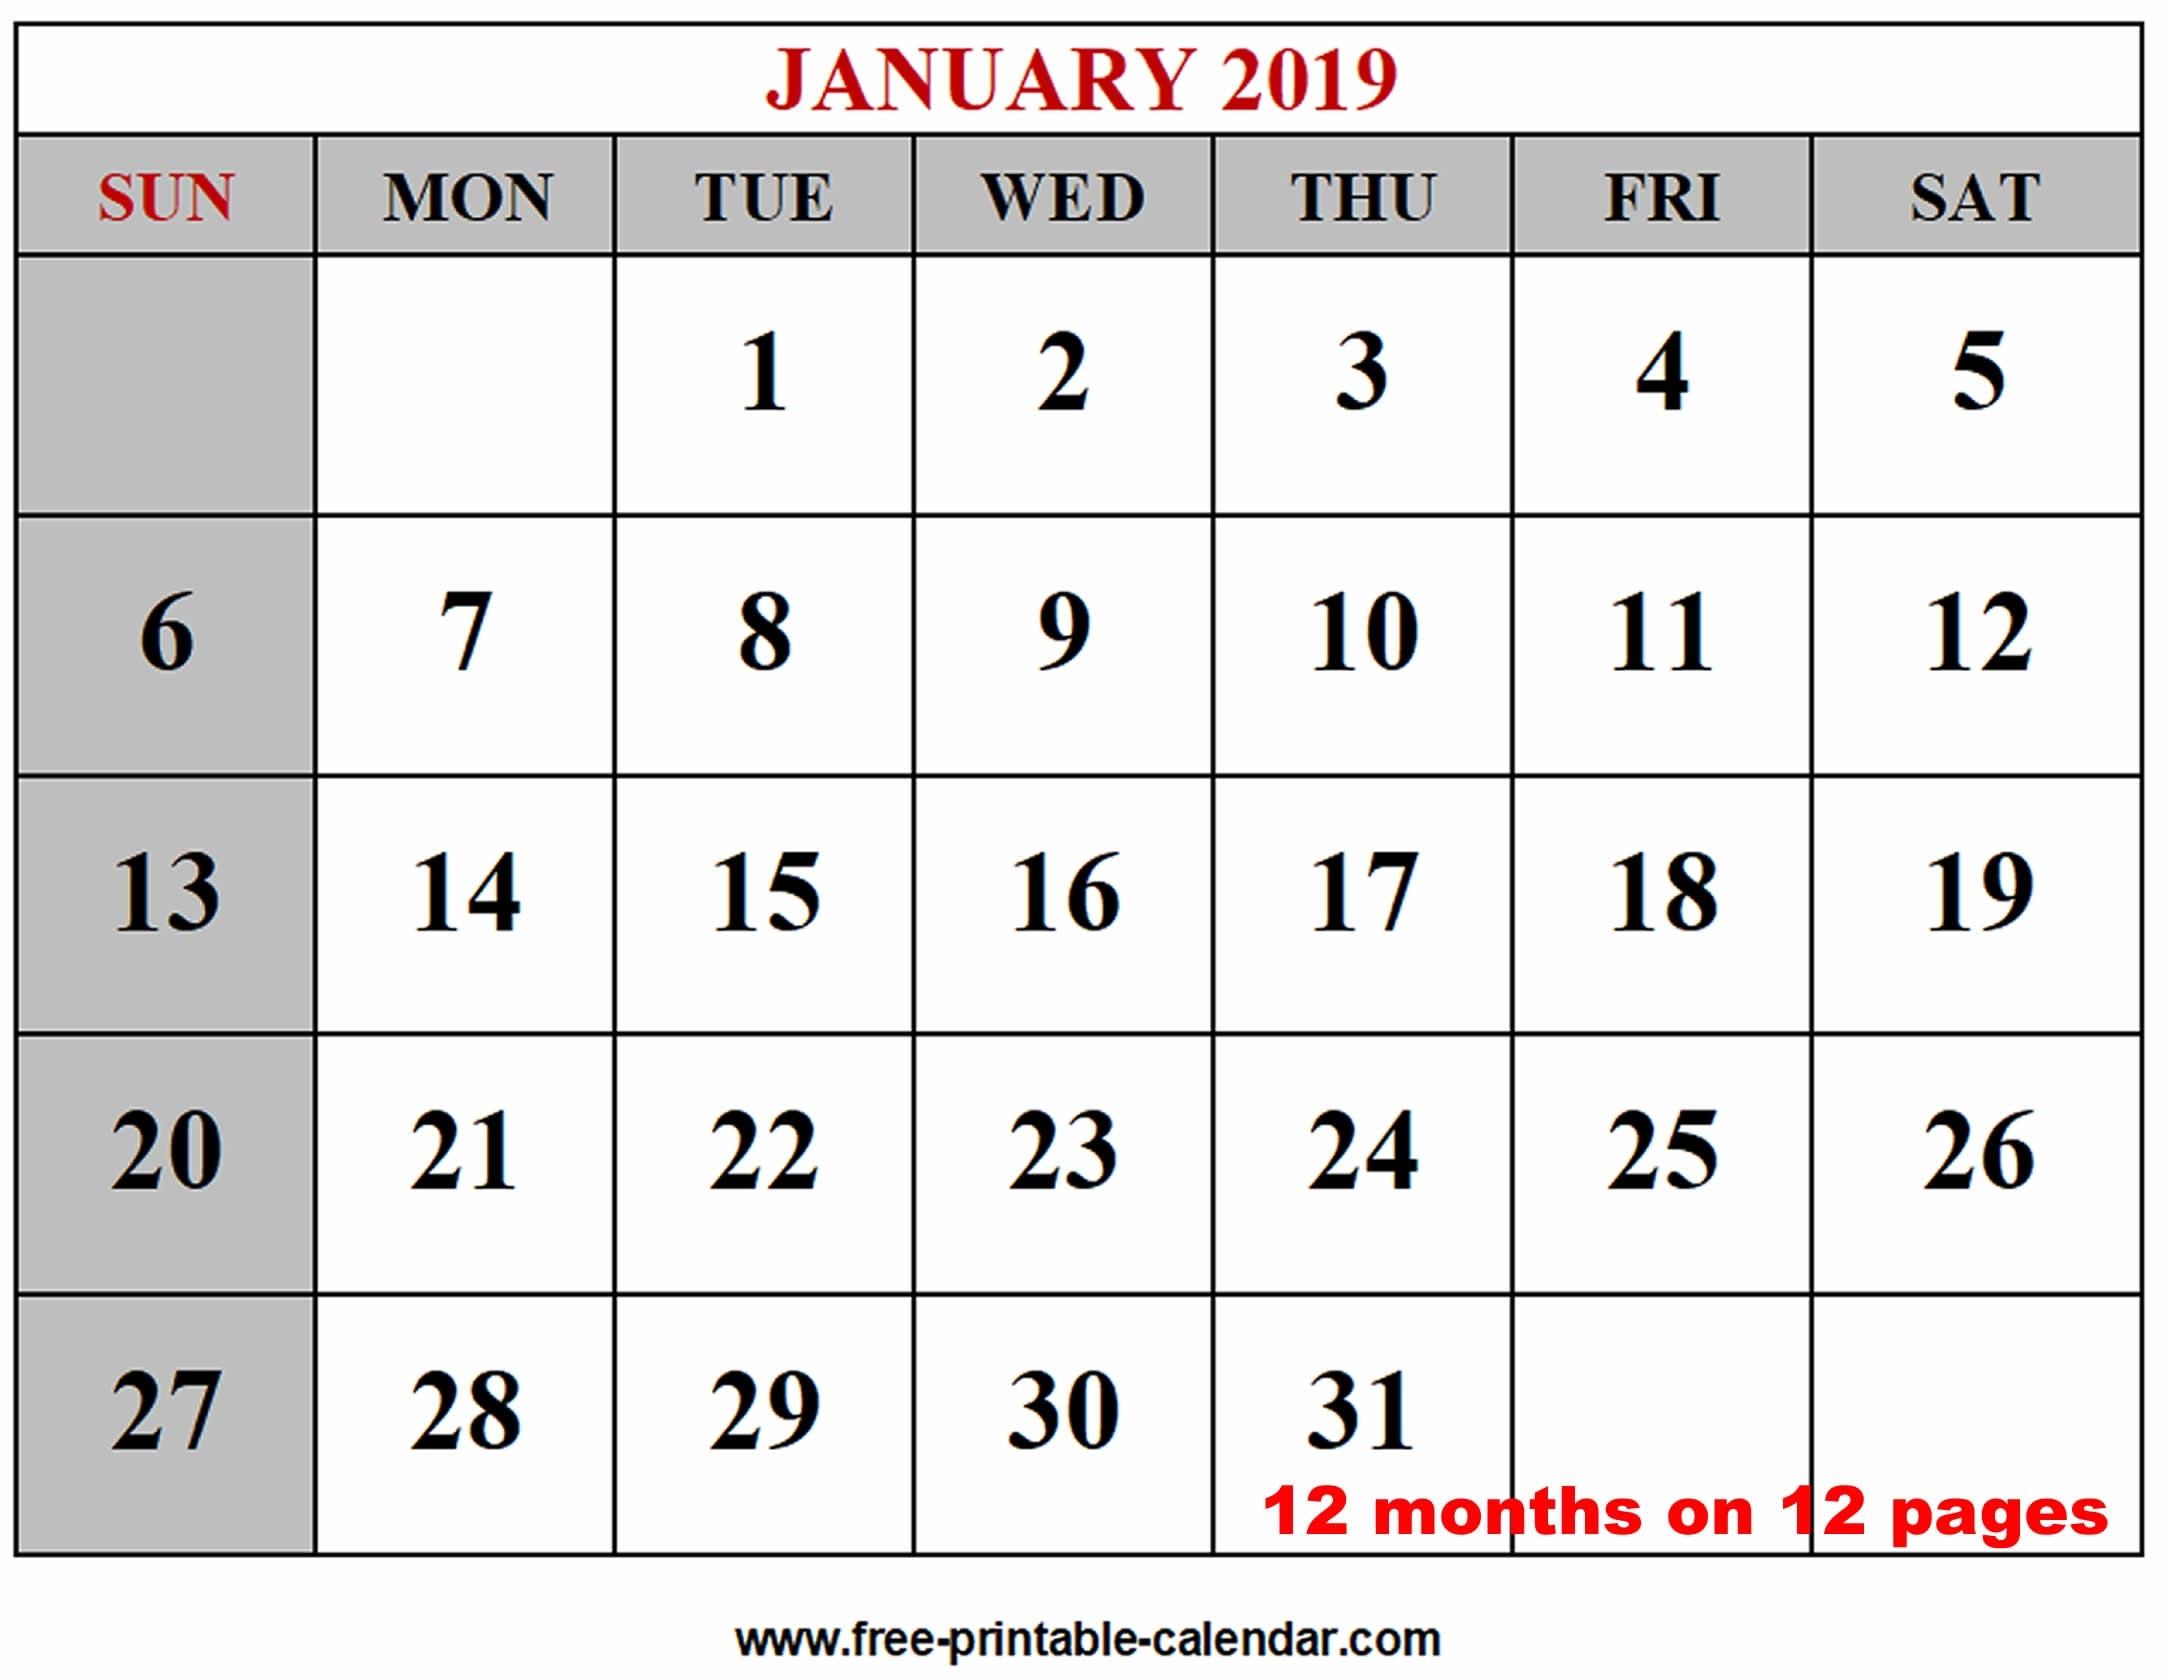 Year 2019 Calendar Templates - Free-Printable-Calendar